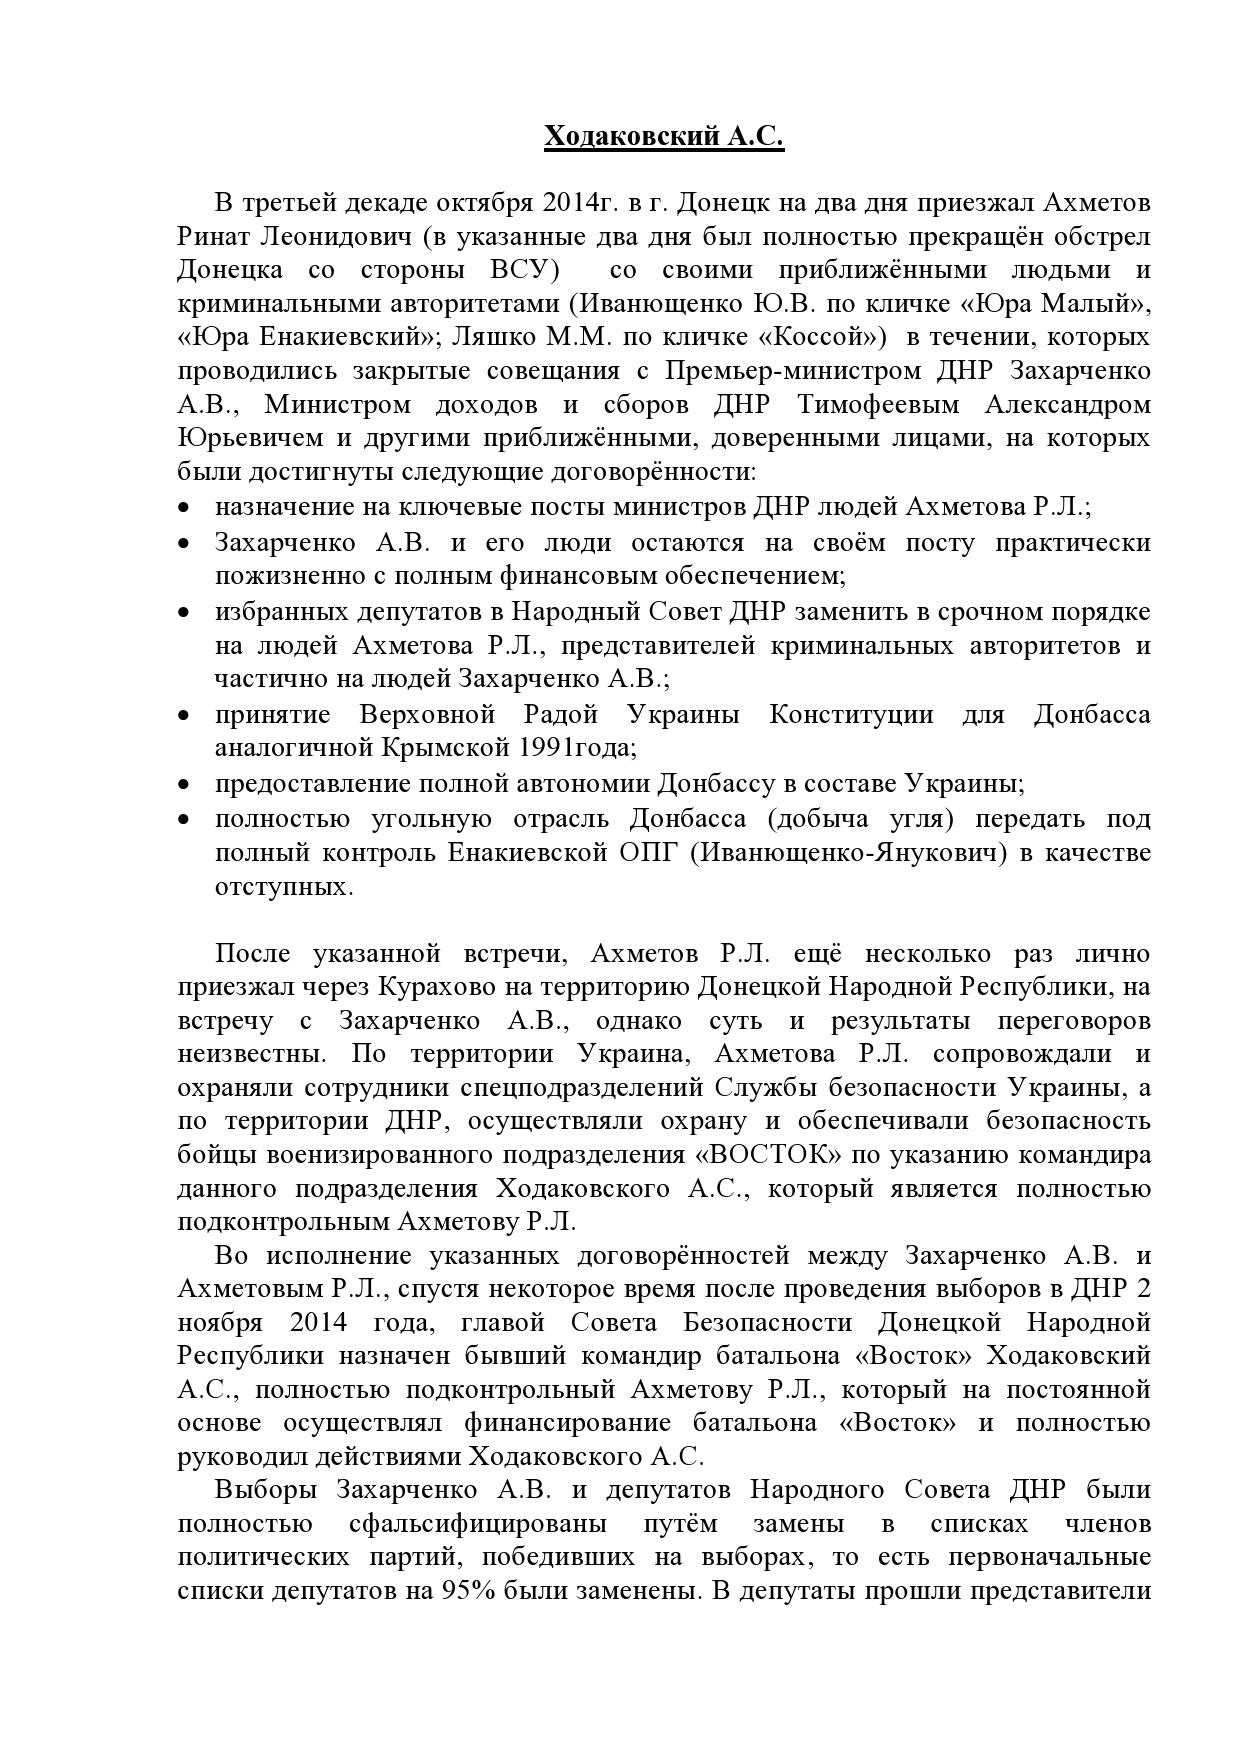 https://b0ltai.files.wordpress.com/2015/09/page0001.jpg